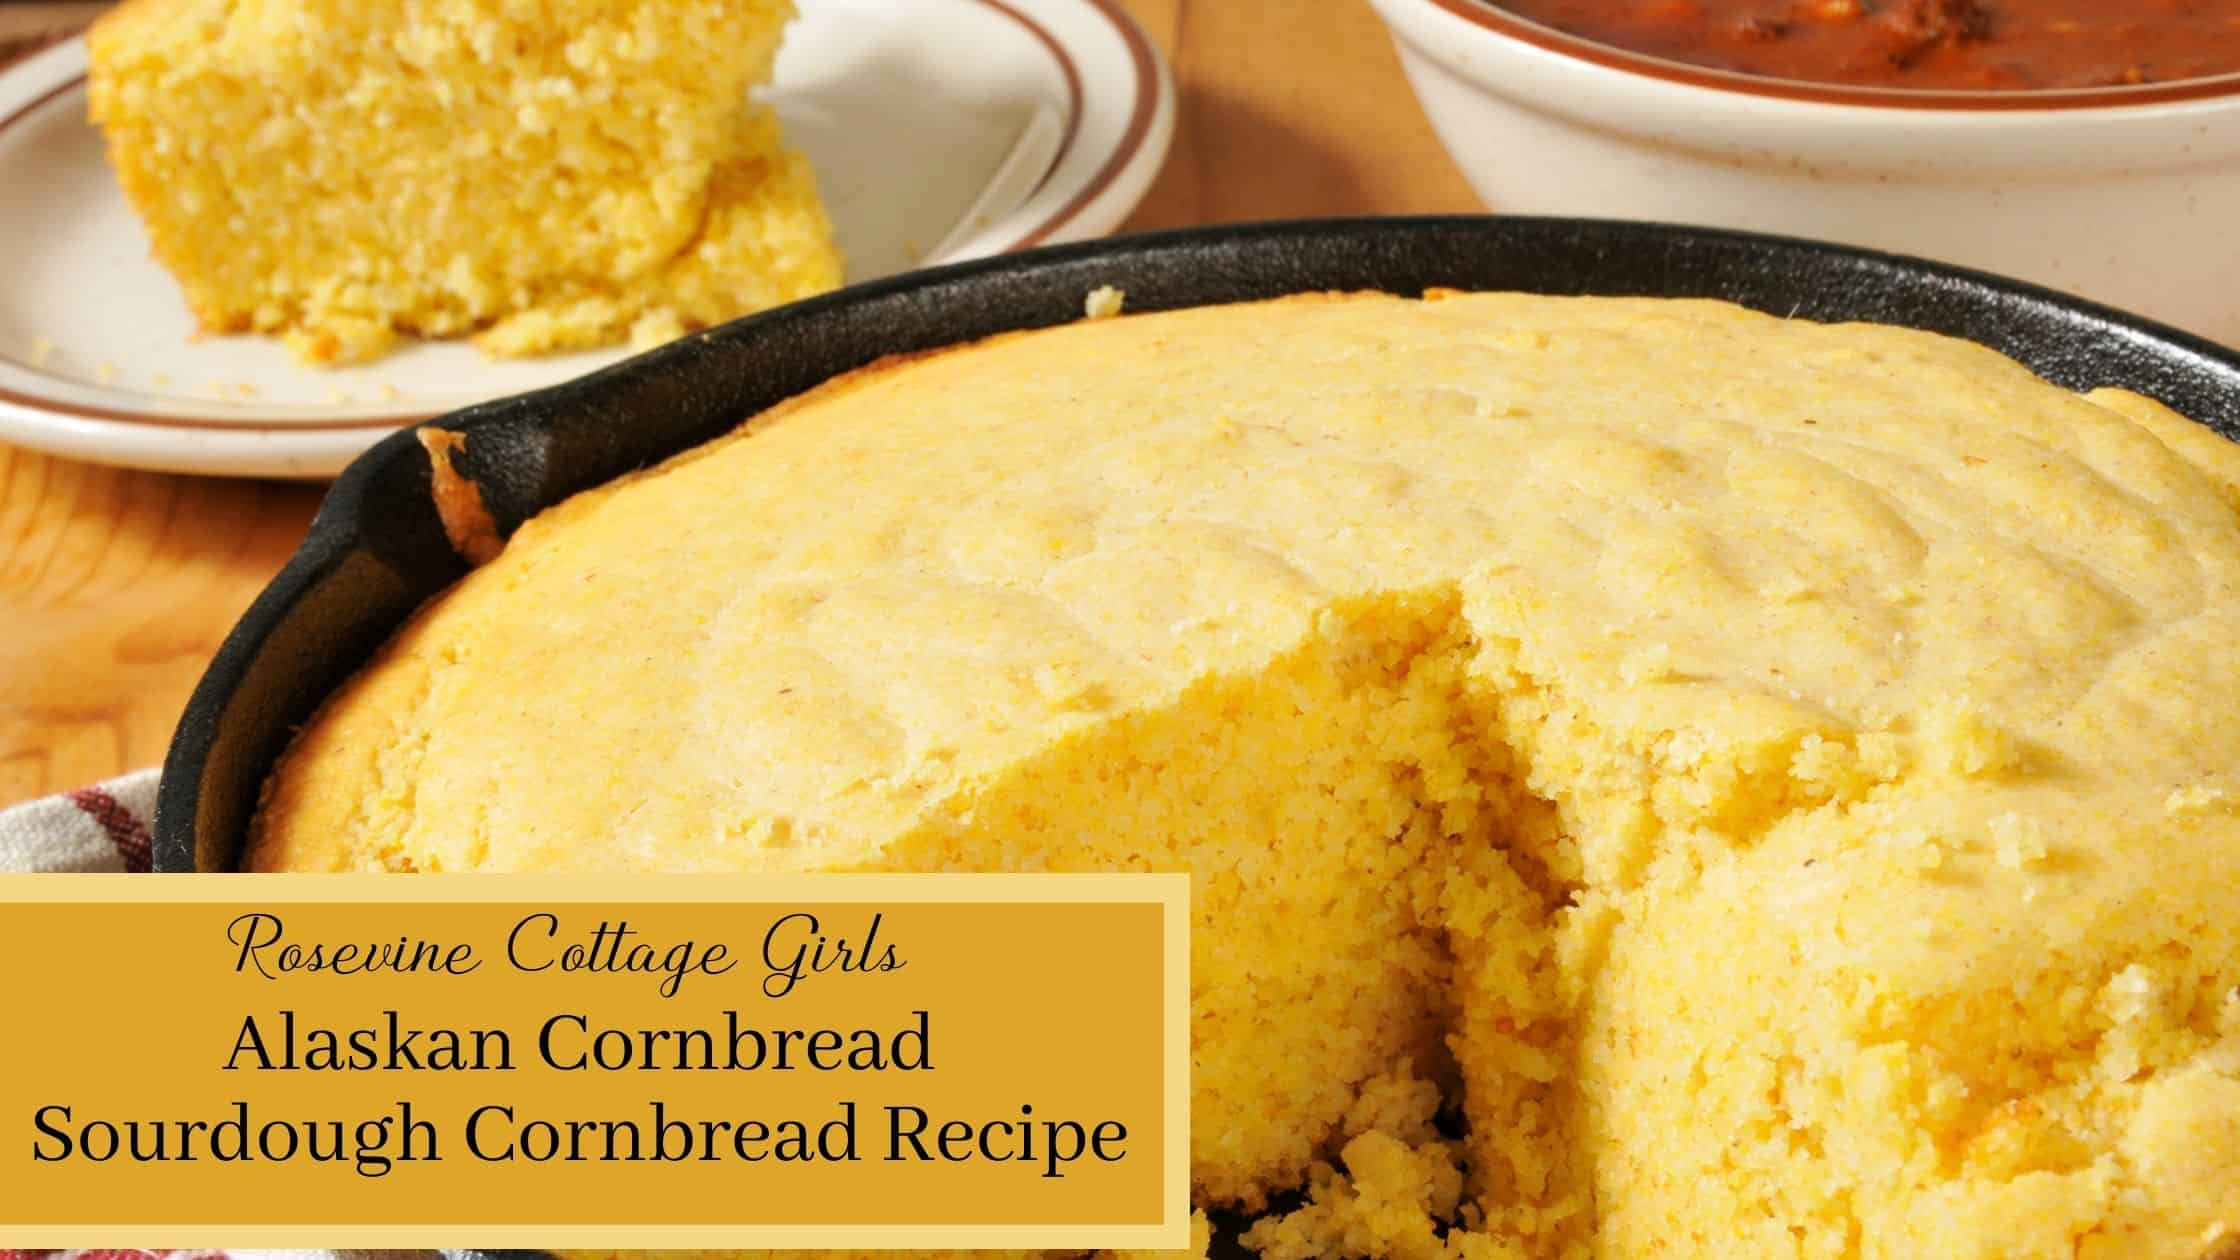 Sourdough Cornbread Recipe | photo of a cast iron dutch oven with sourdough cornbread in it and a slice of cornbread on a plate in the background